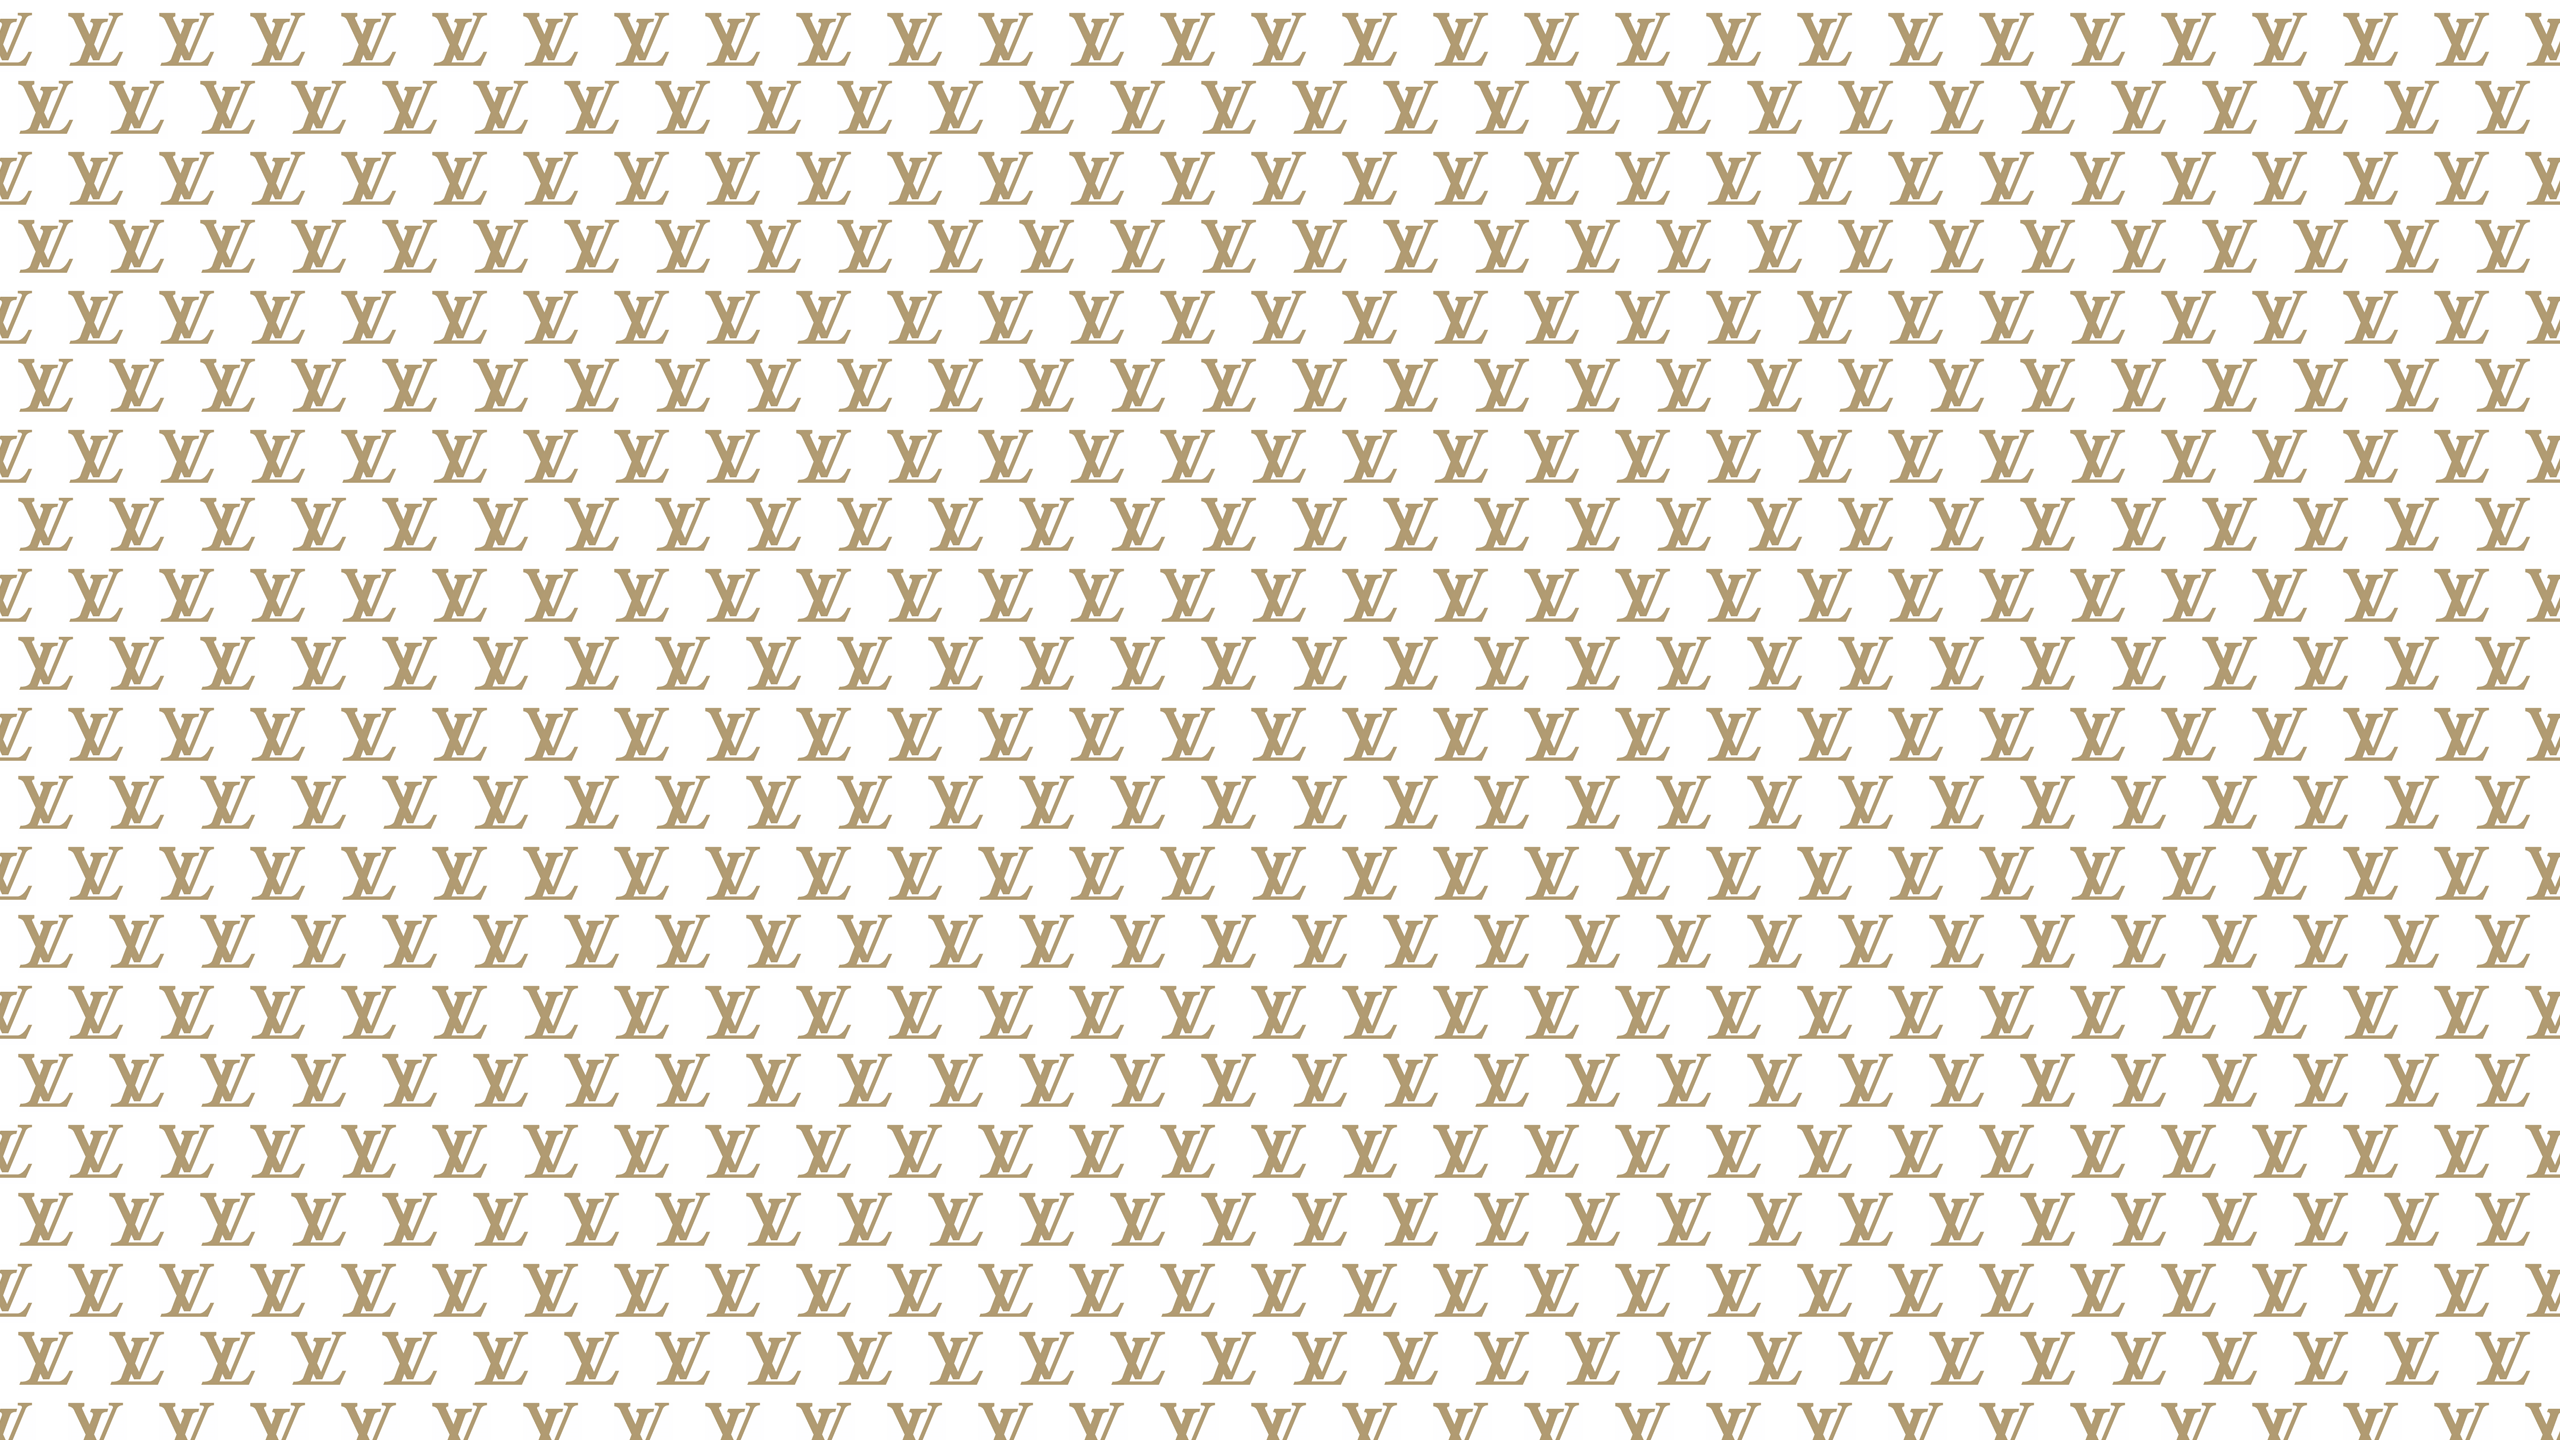 louis vuitton wallpaper for home